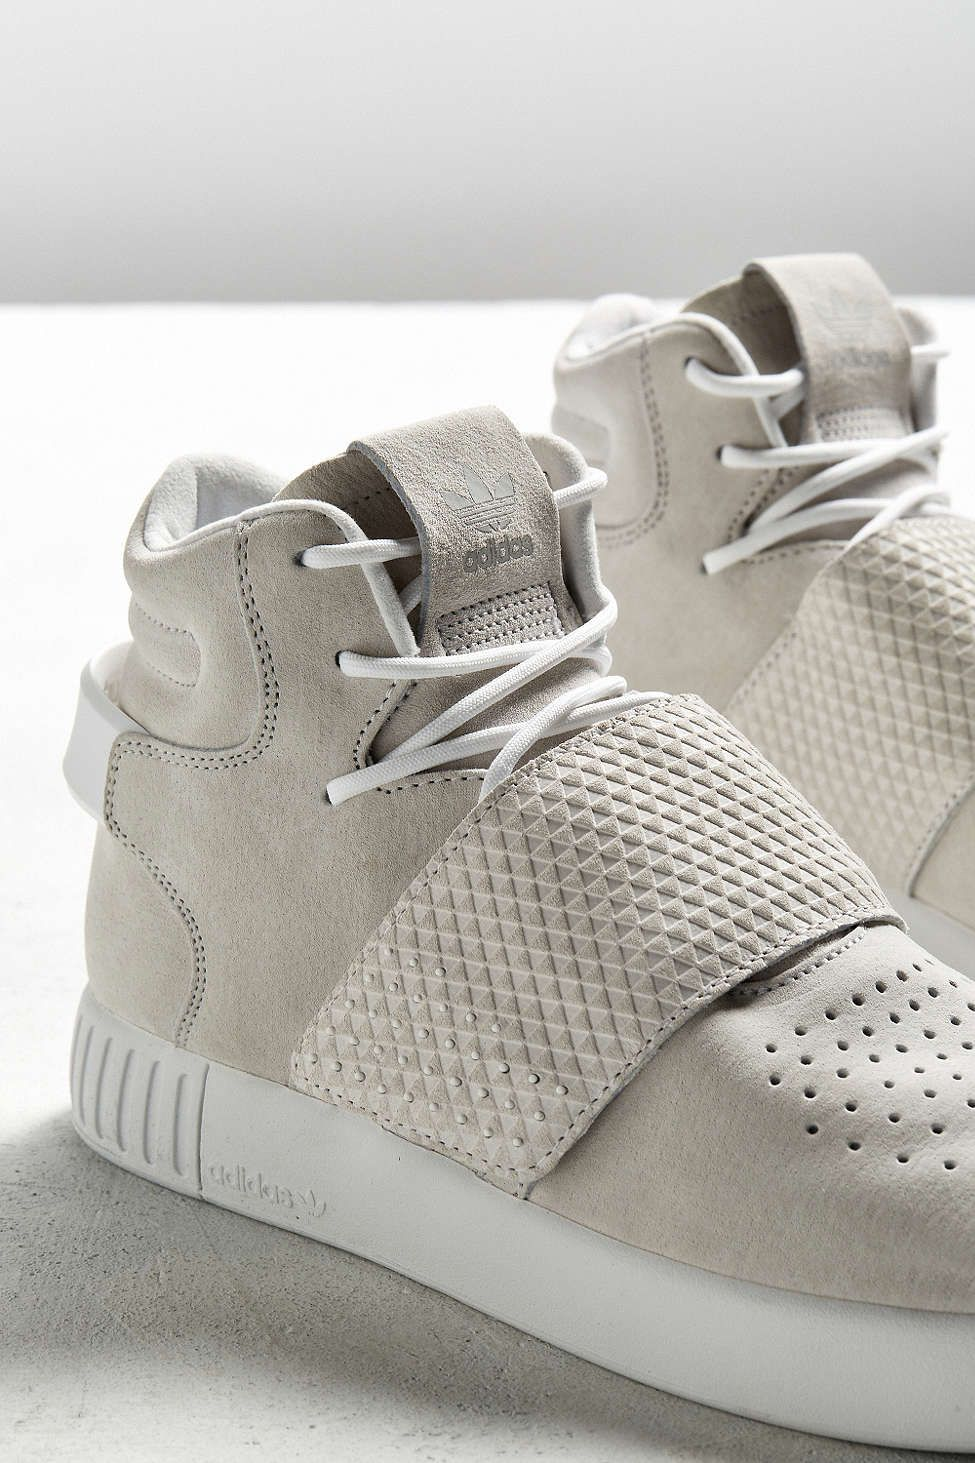 Adidas Tubular Invader Strap Sneaker Adidas Tubular Invader Strap Addidas Shoes Sneakers